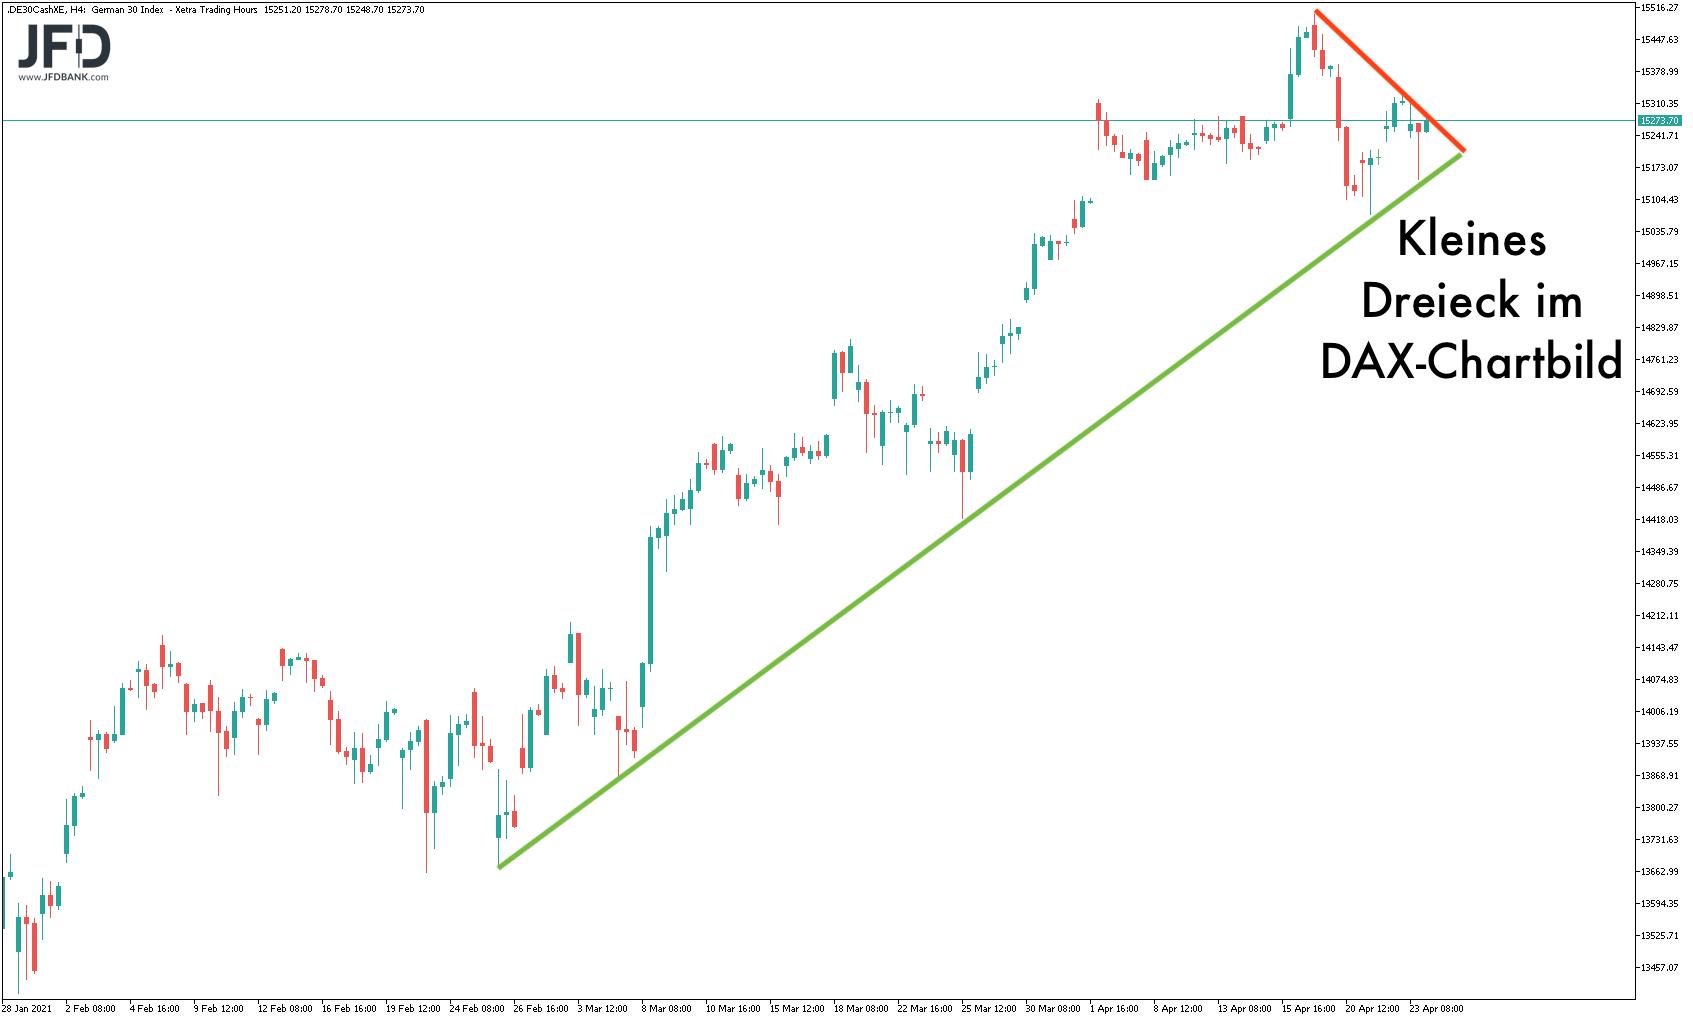 Dreiecksformation im DAX